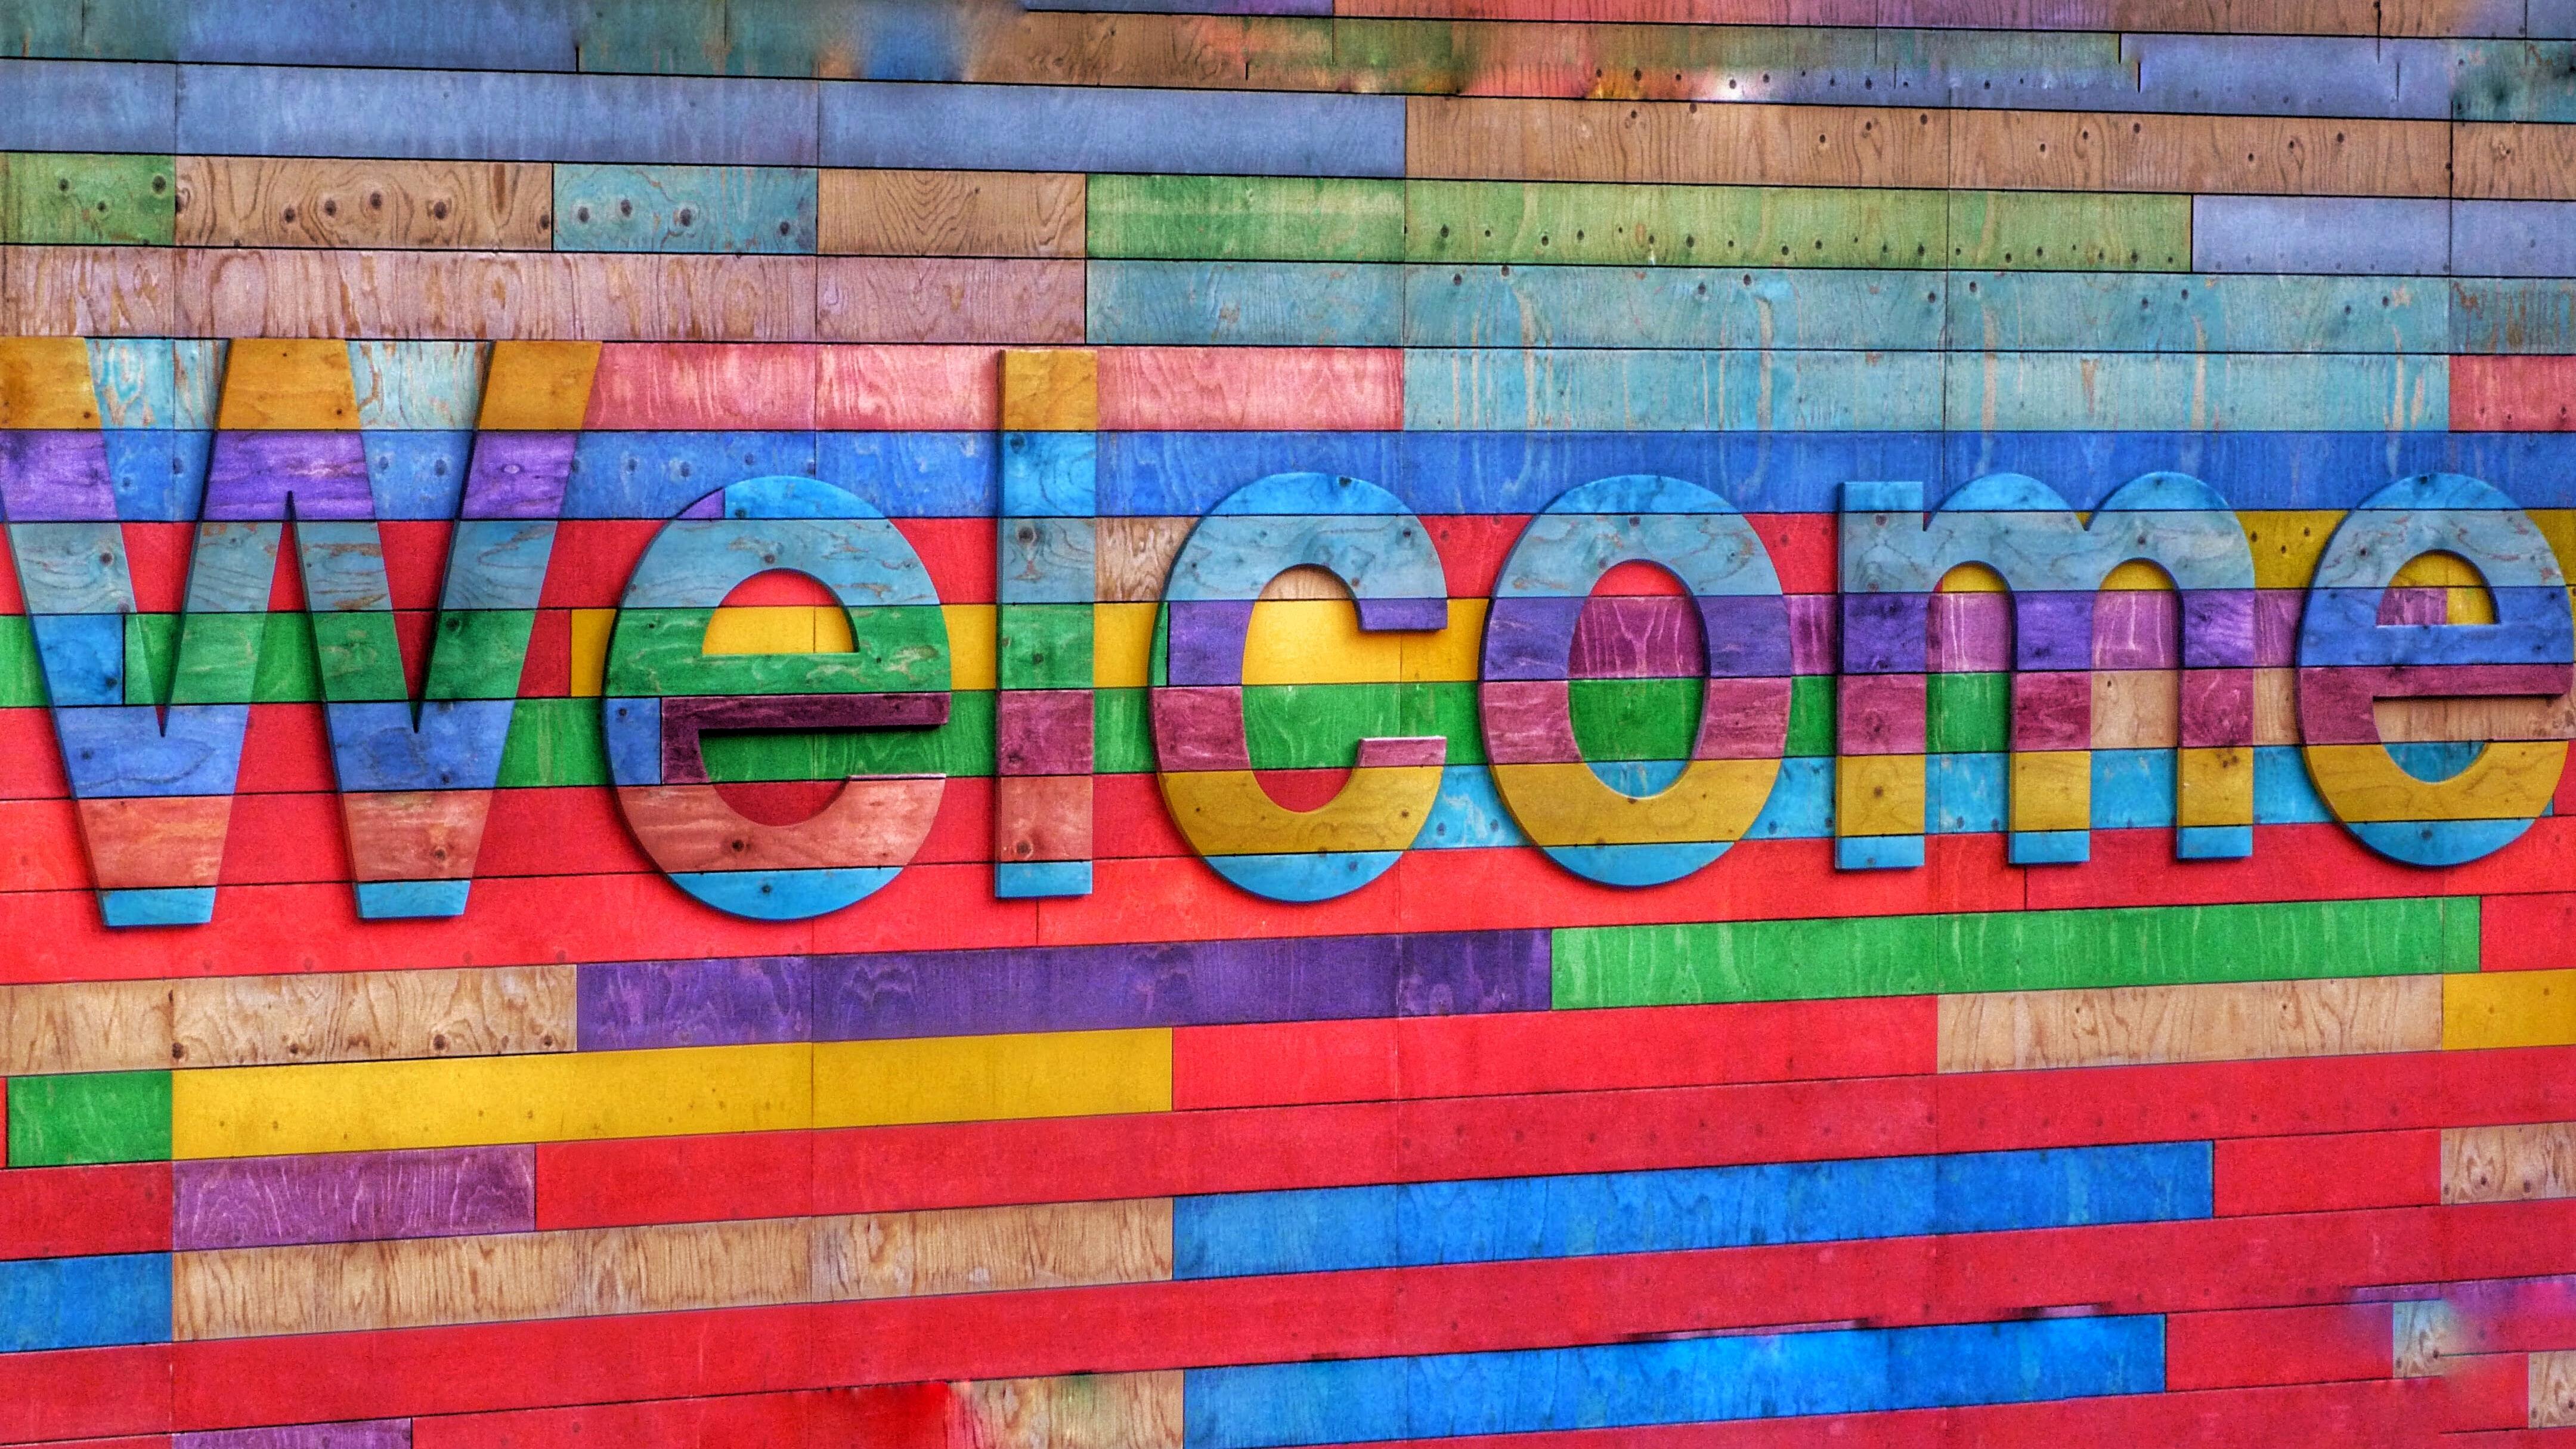 Buntes Welcome-Schild